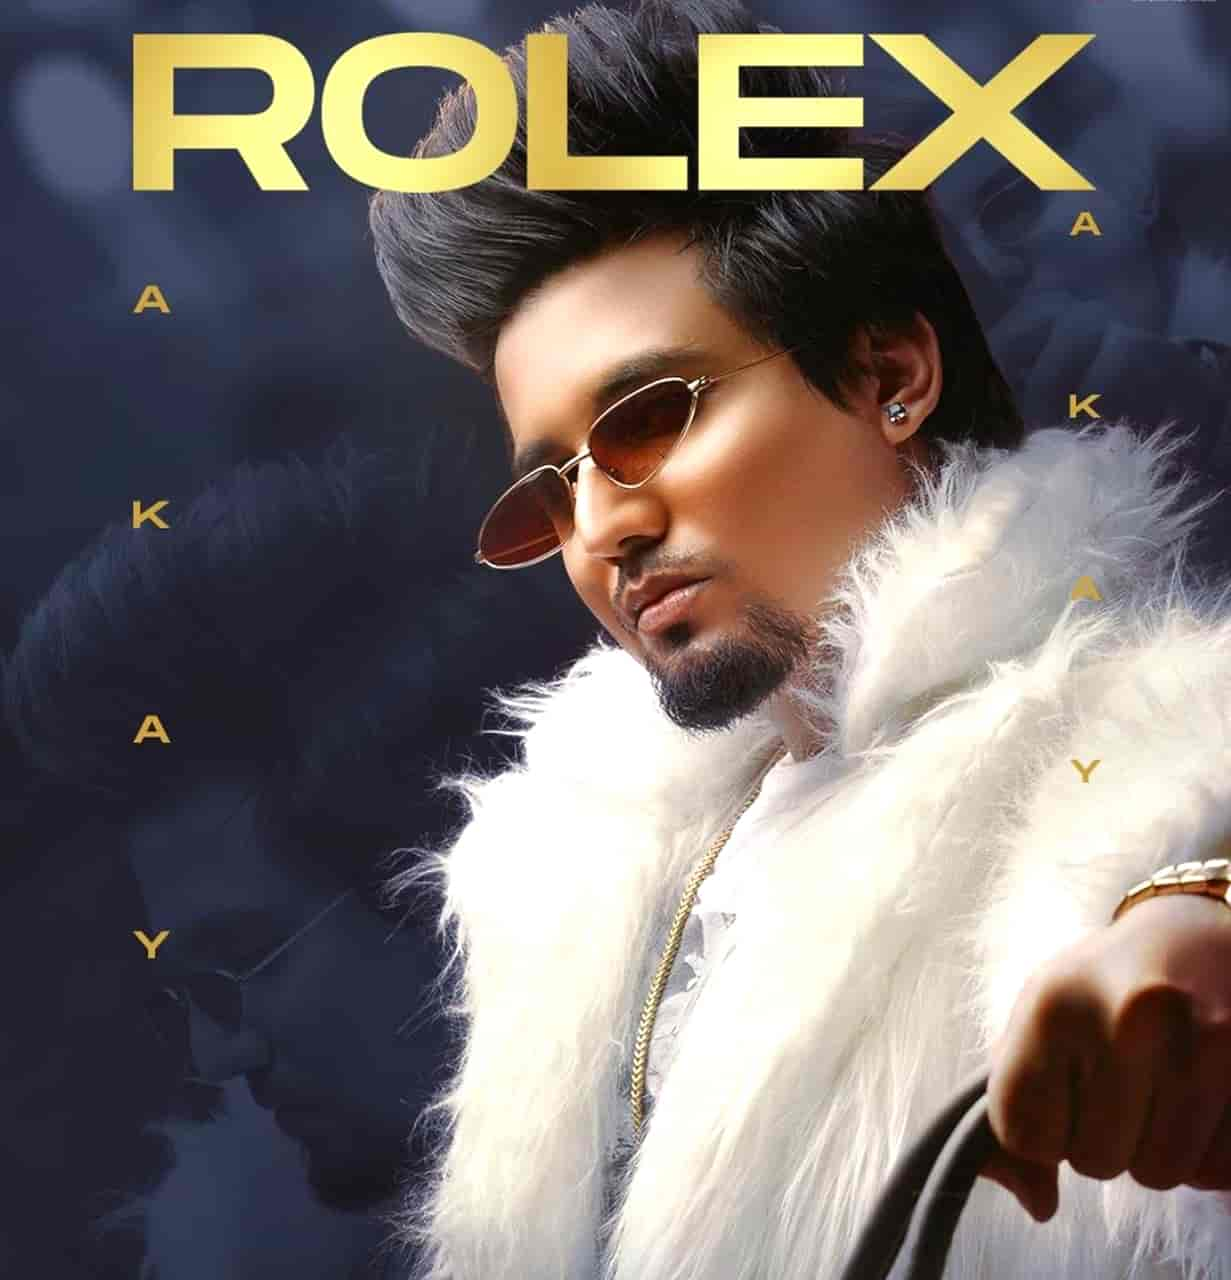 Rolex Punjabi Song Lyrics A Kay